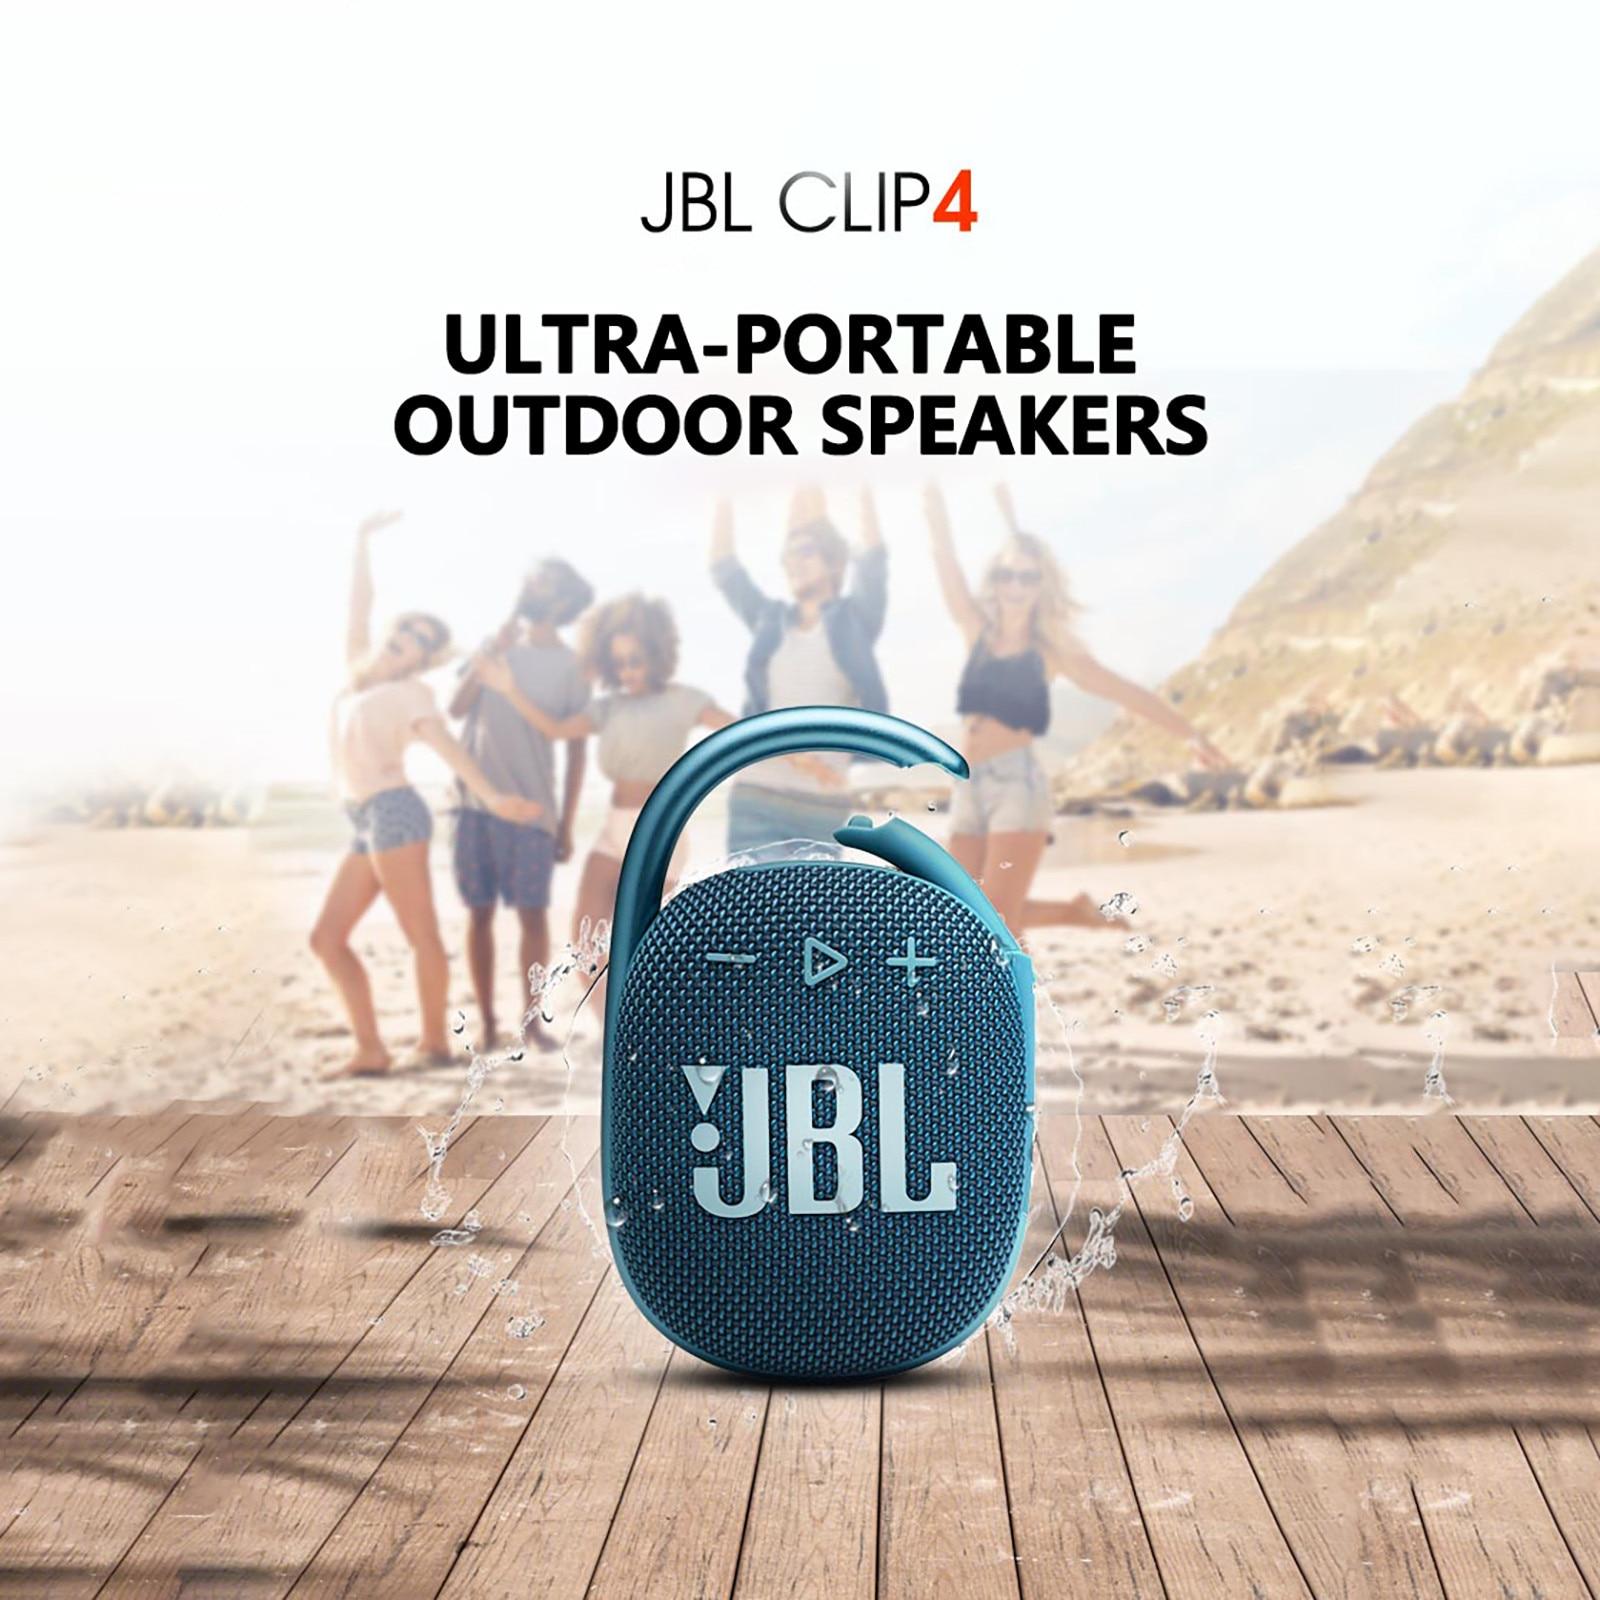 Jbl Clip 4 Wireless Bluetooth 5.1 Mini Speakers Portable Ip67 Waterproof Outdoor Bass Speakers With Hook 10 Hours Battery#g3